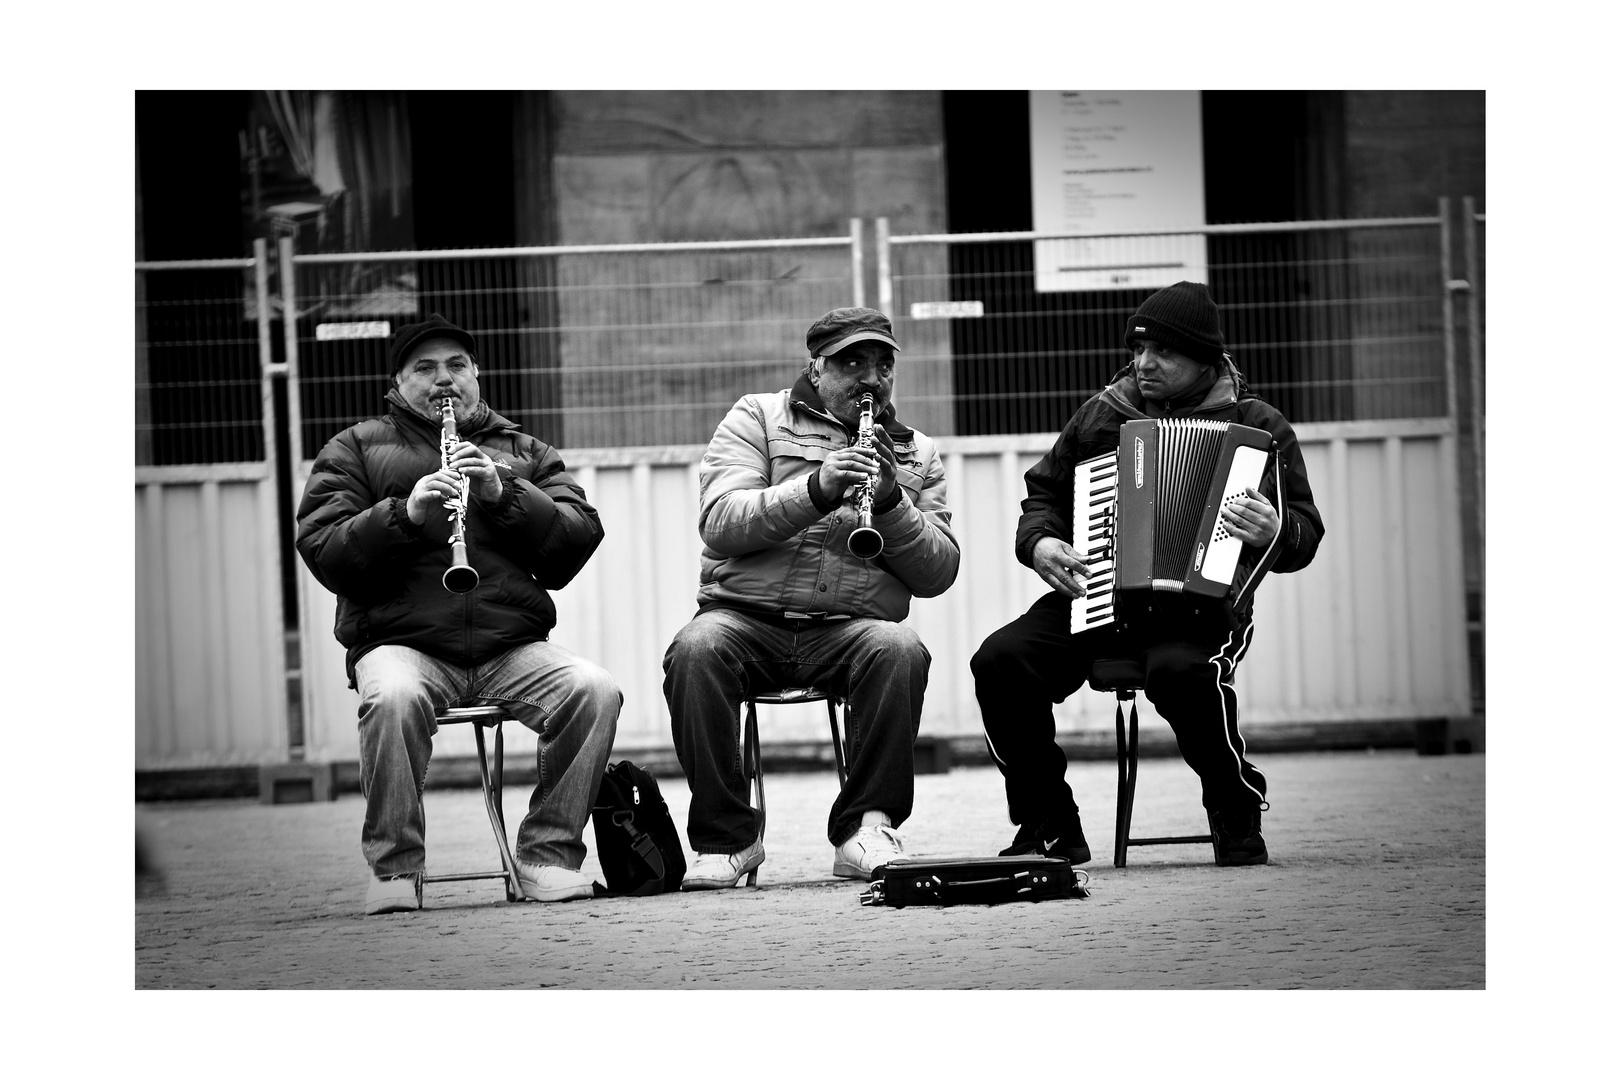 Die 3 Herren vor dem Bauzaun